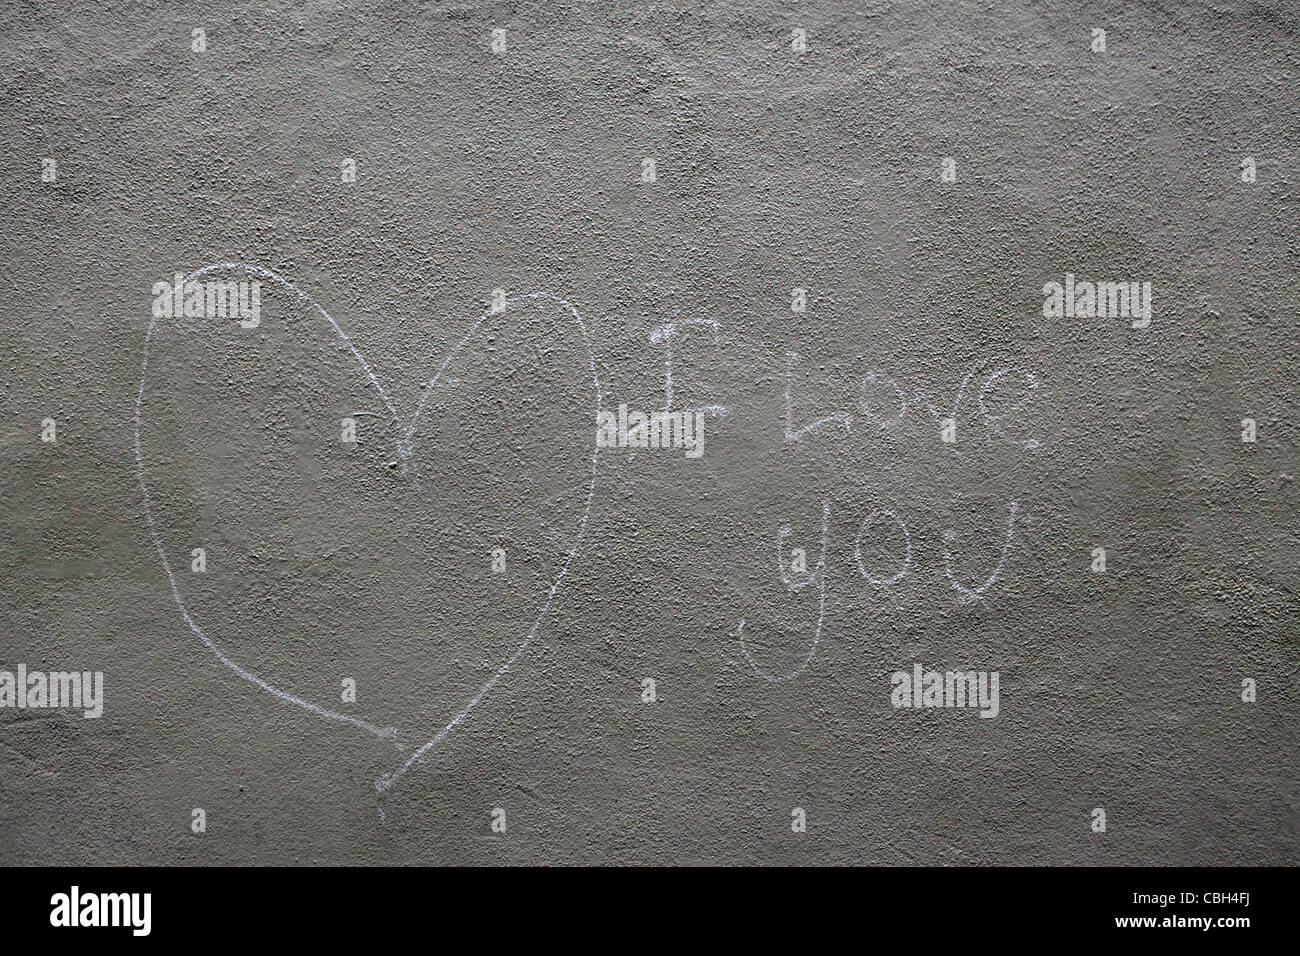 Graffiti wall usa -  I Love You And Heart Graffiti Wall In Manhattan Nyc Usa